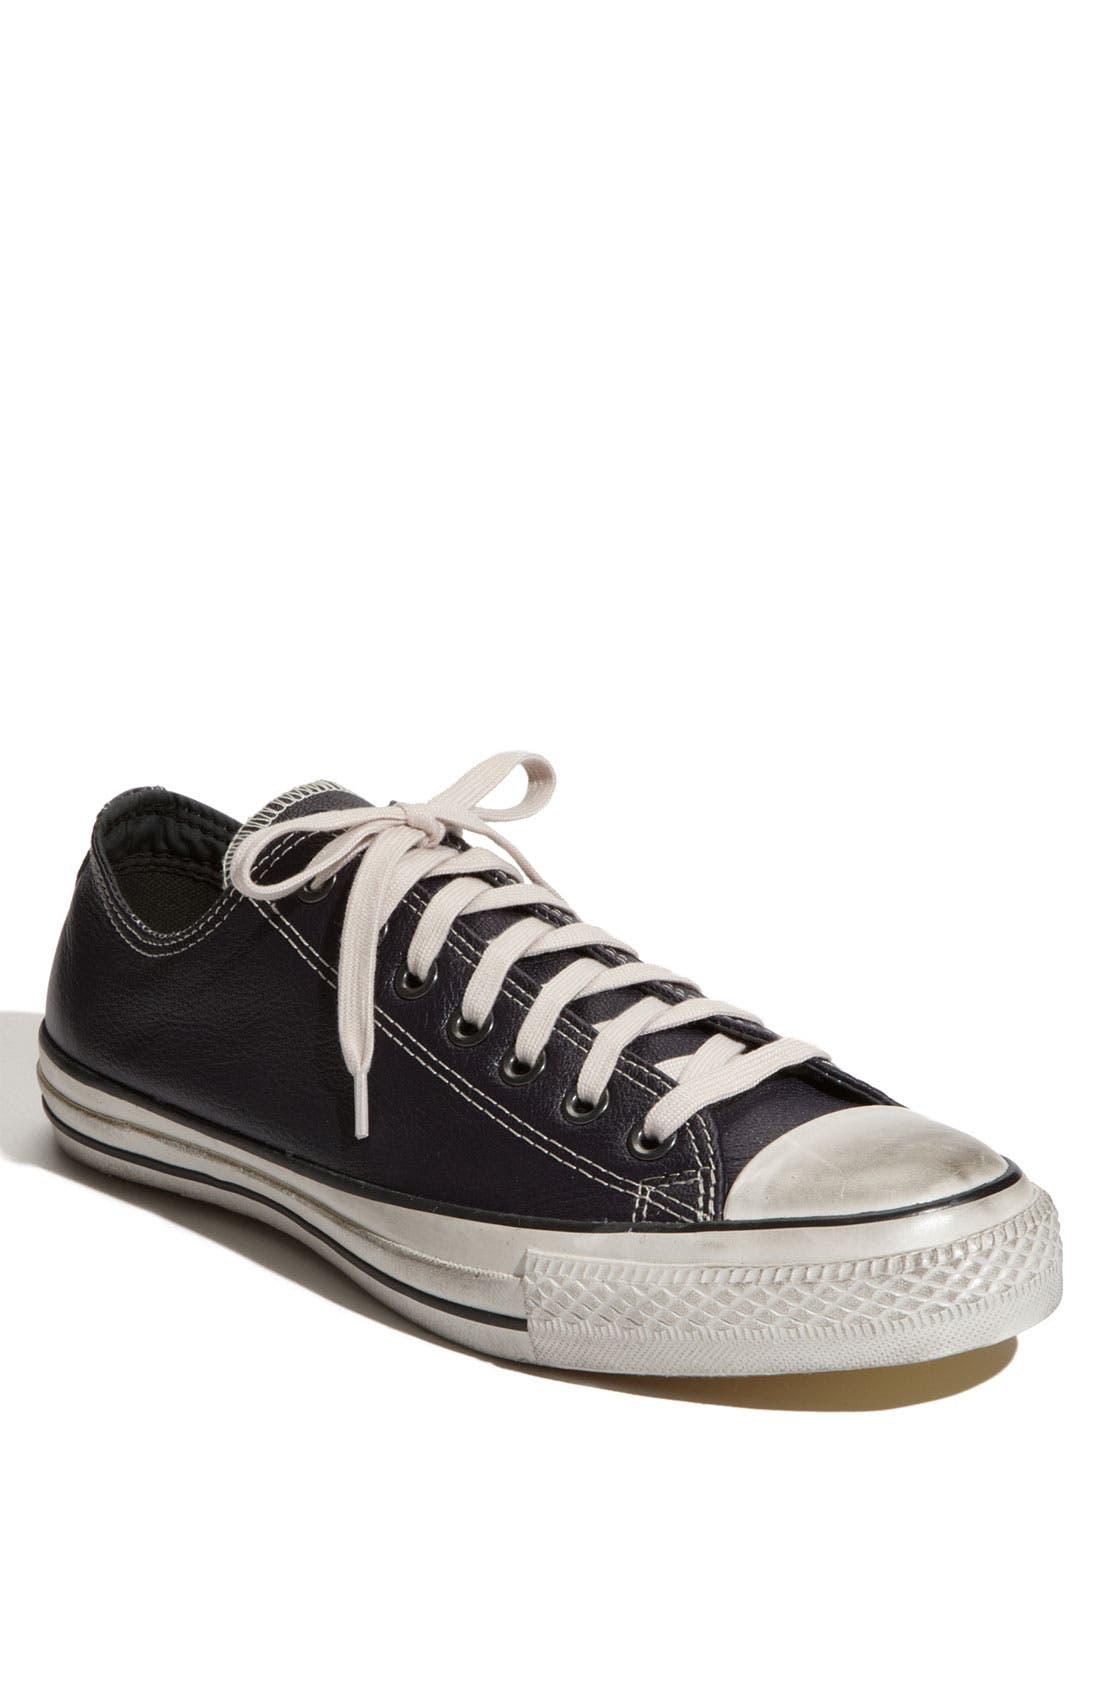 Main Image - Converse by John Varvatos Sneaker